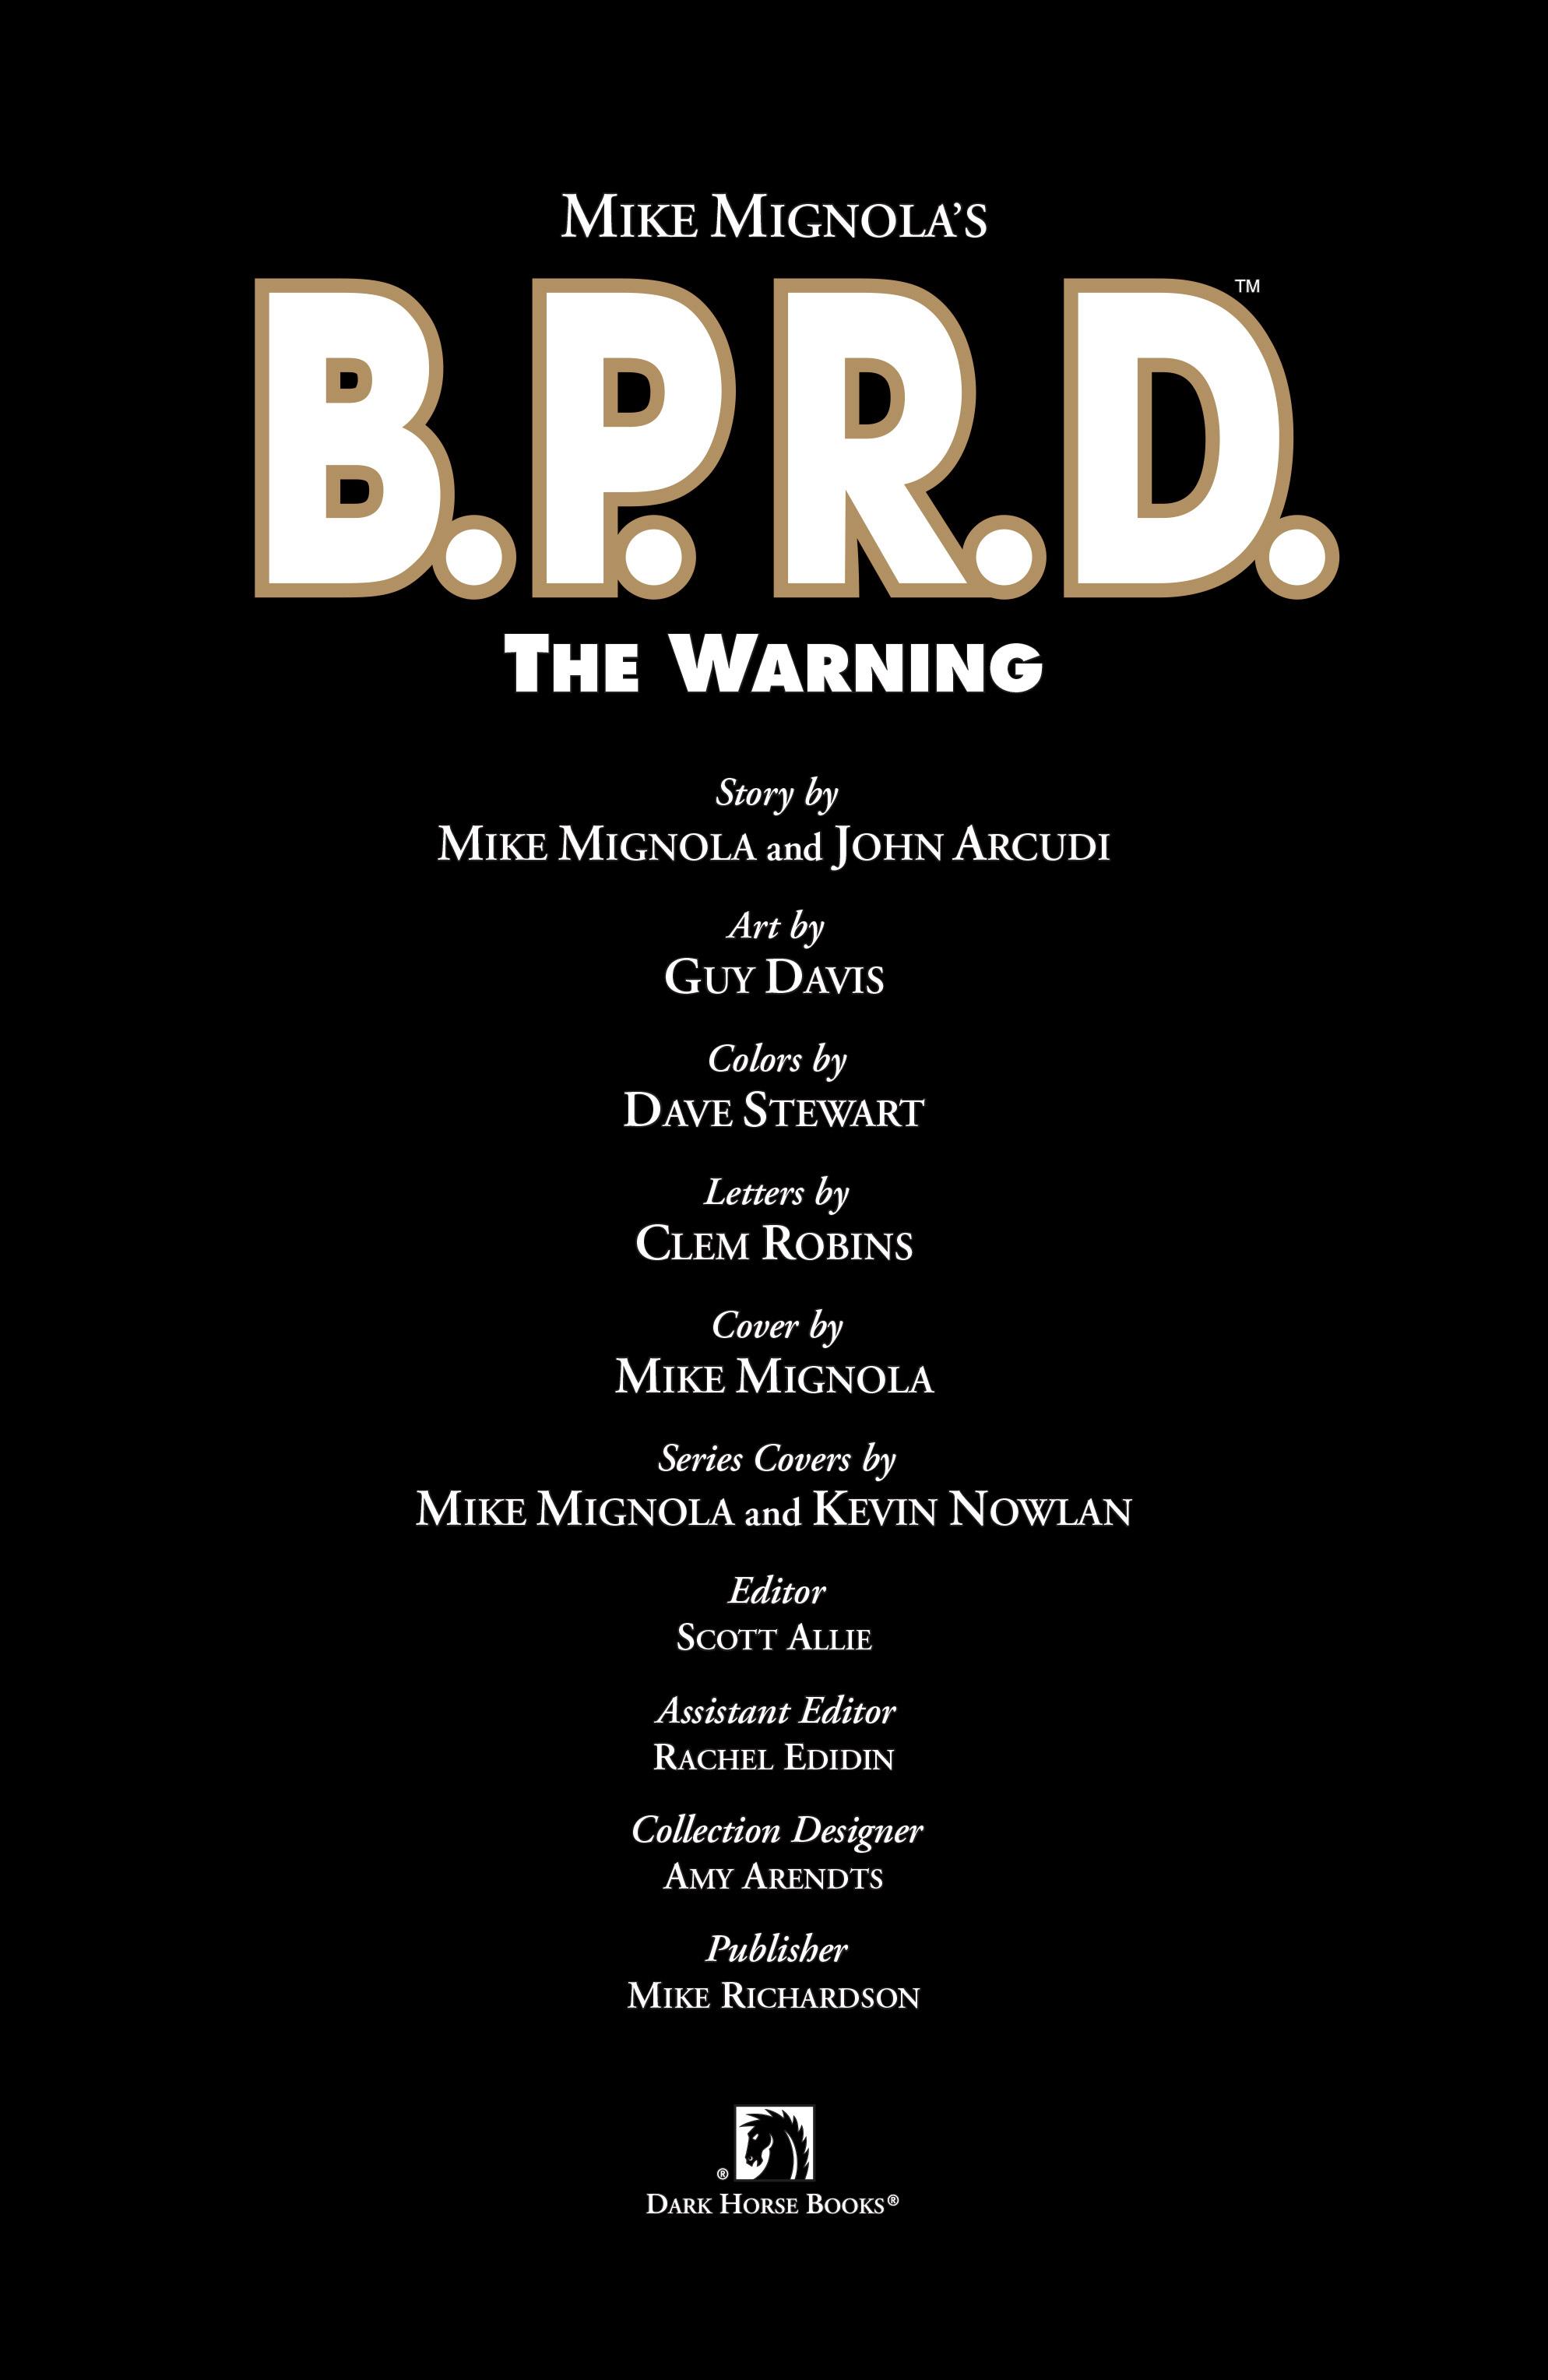 Read online B.P.R.D. (2003) comic -  Issue # TPB 10 - 4